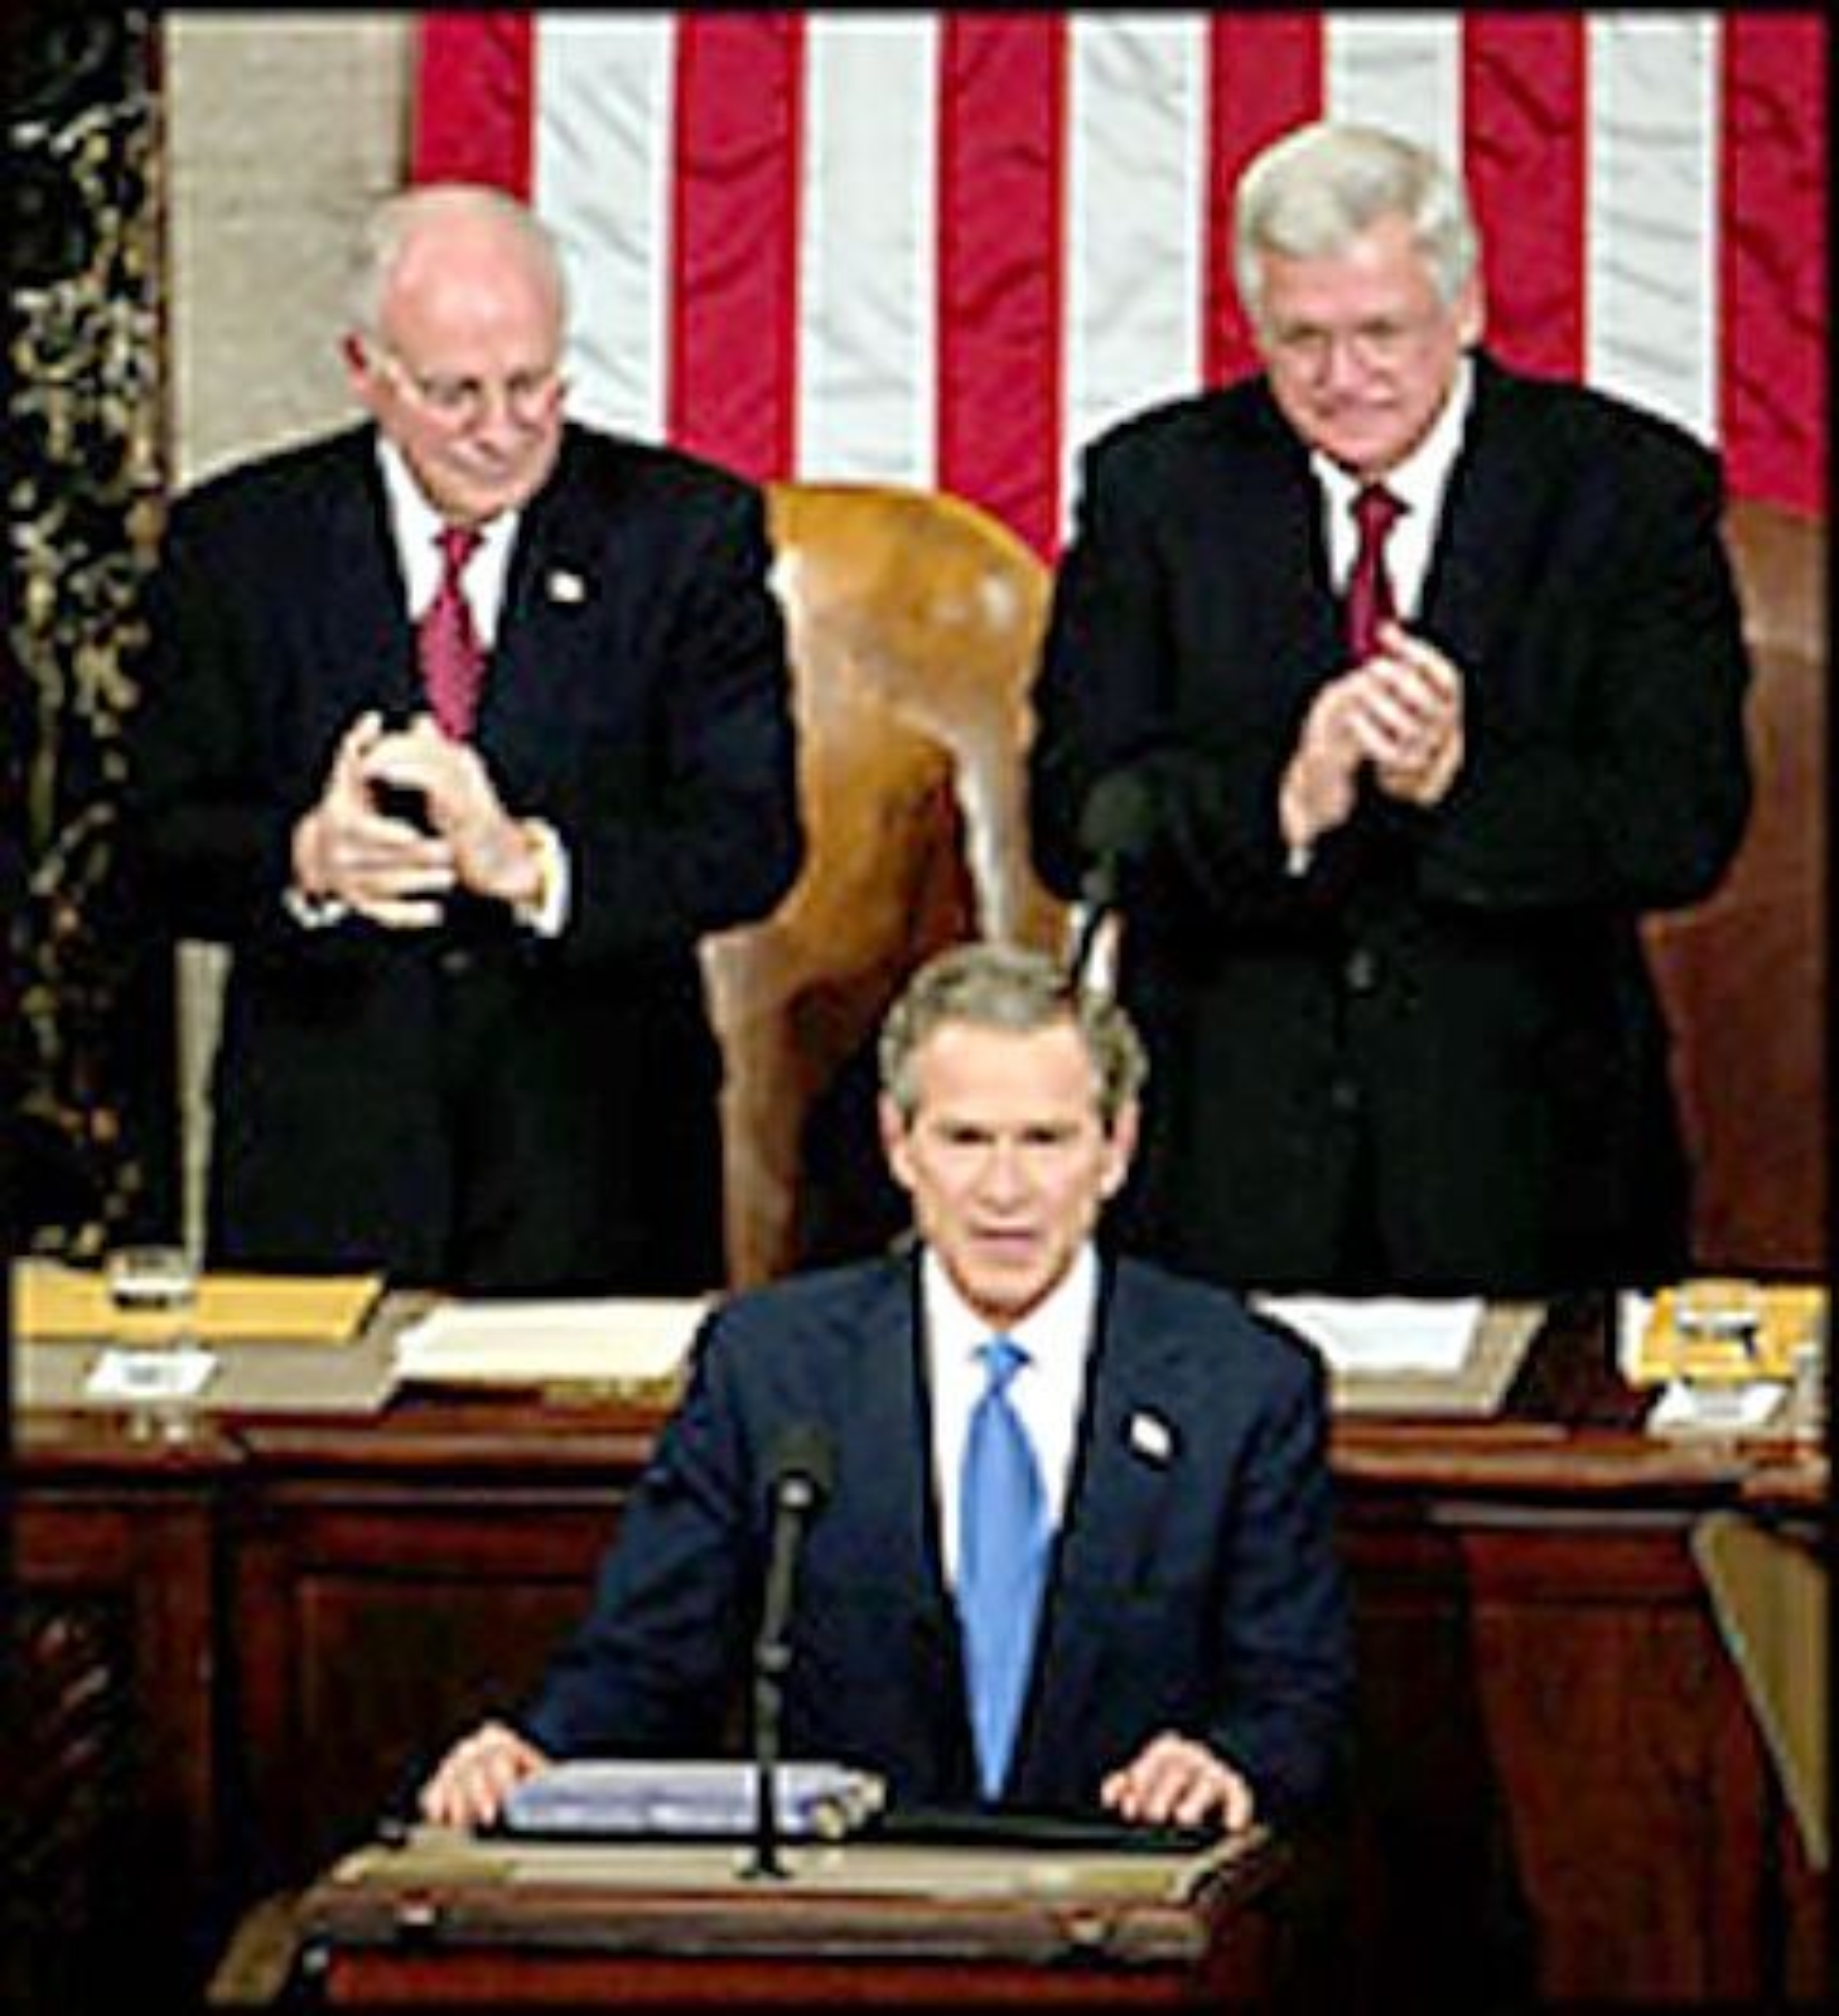 President George W. Bush på talerstolen med visepresident Dick Cheney ivrig applaudrende til venstre bak ham.